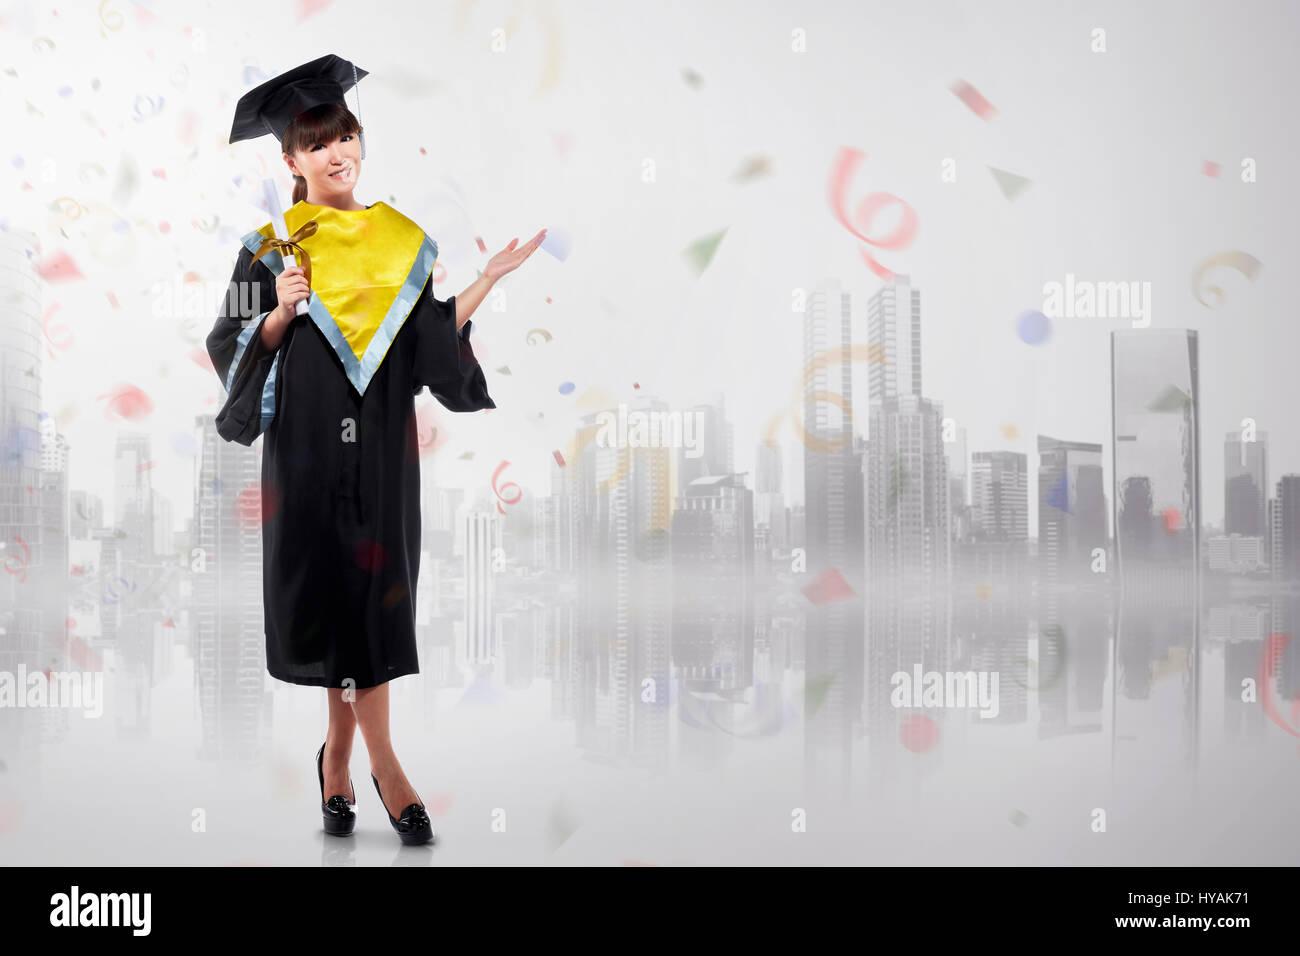 Cheerful Asian Woman Celebrating Graduation With Graduation Cap Dan